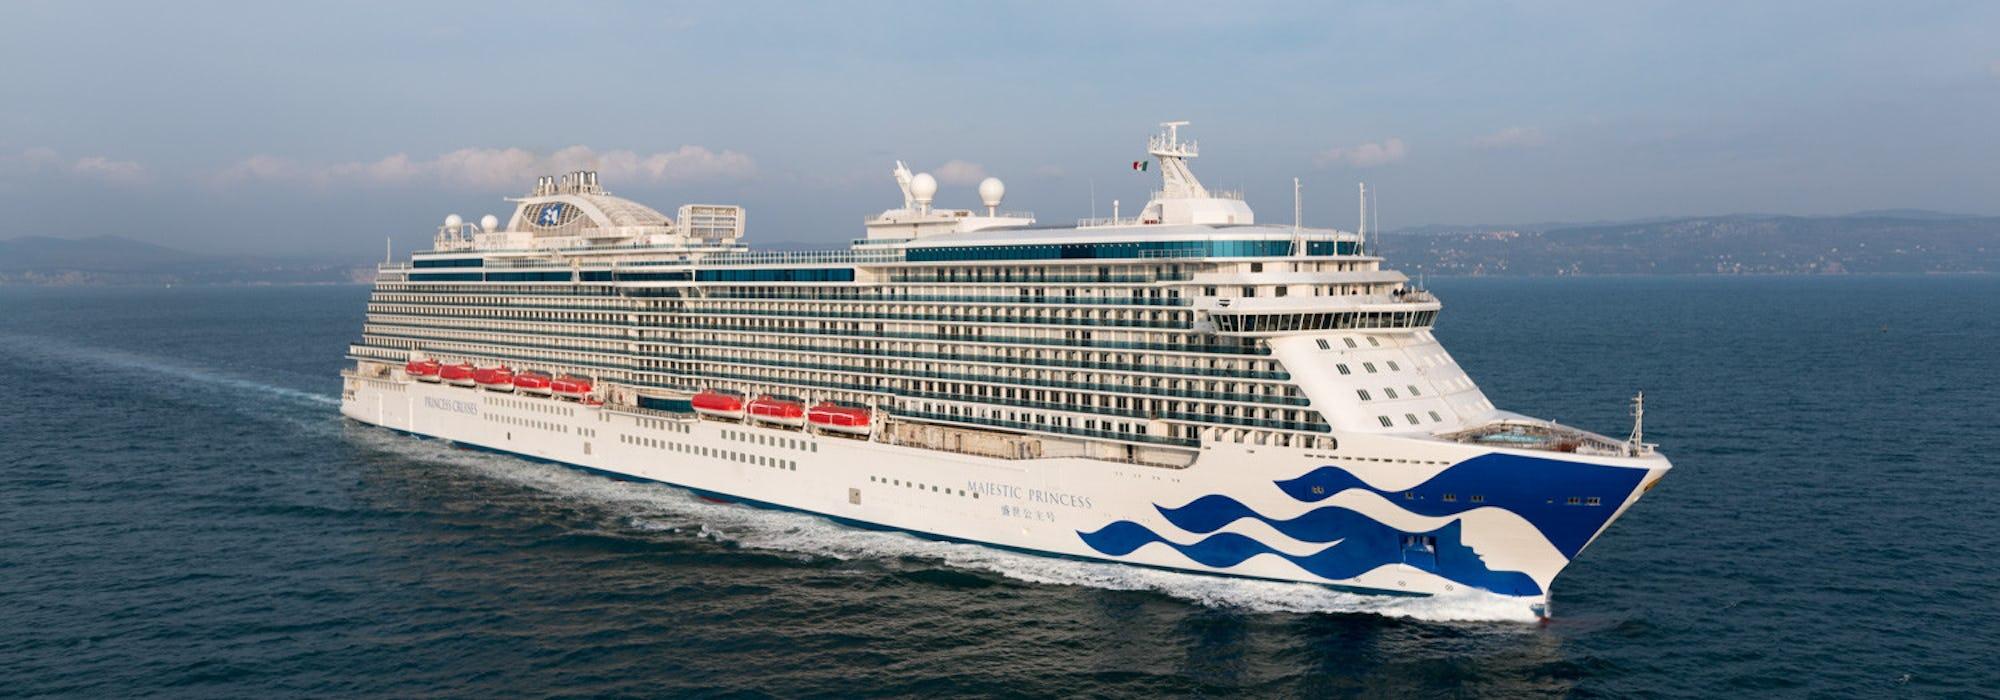 Fartyget Majestic Princess kryssar fram i vattnet.